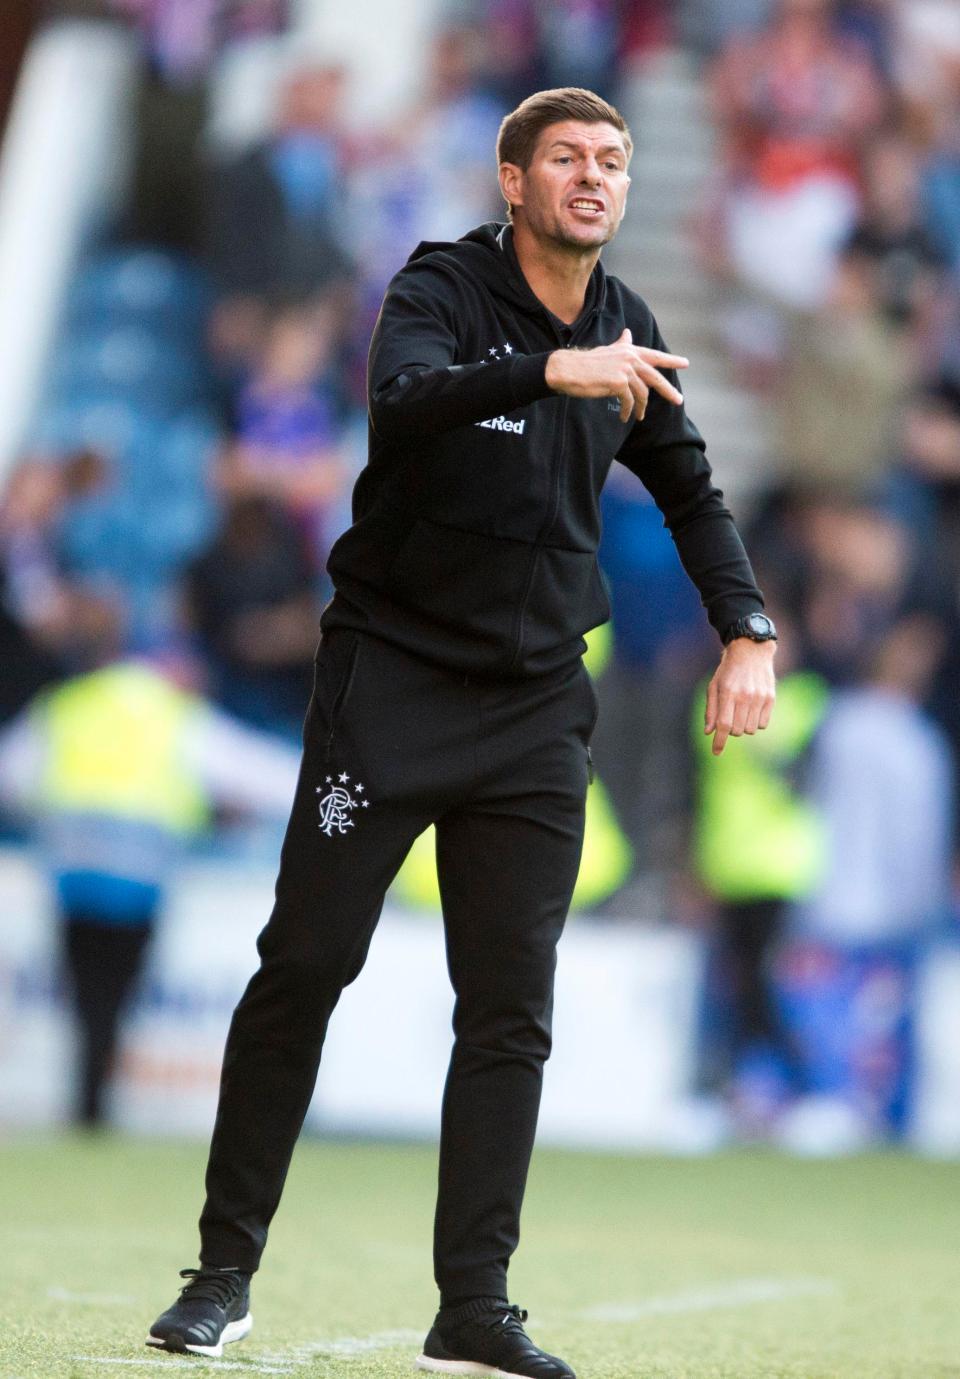 Gerard Jadi Pelatih Rangers Mendapatkan Sambutan Yang Positif